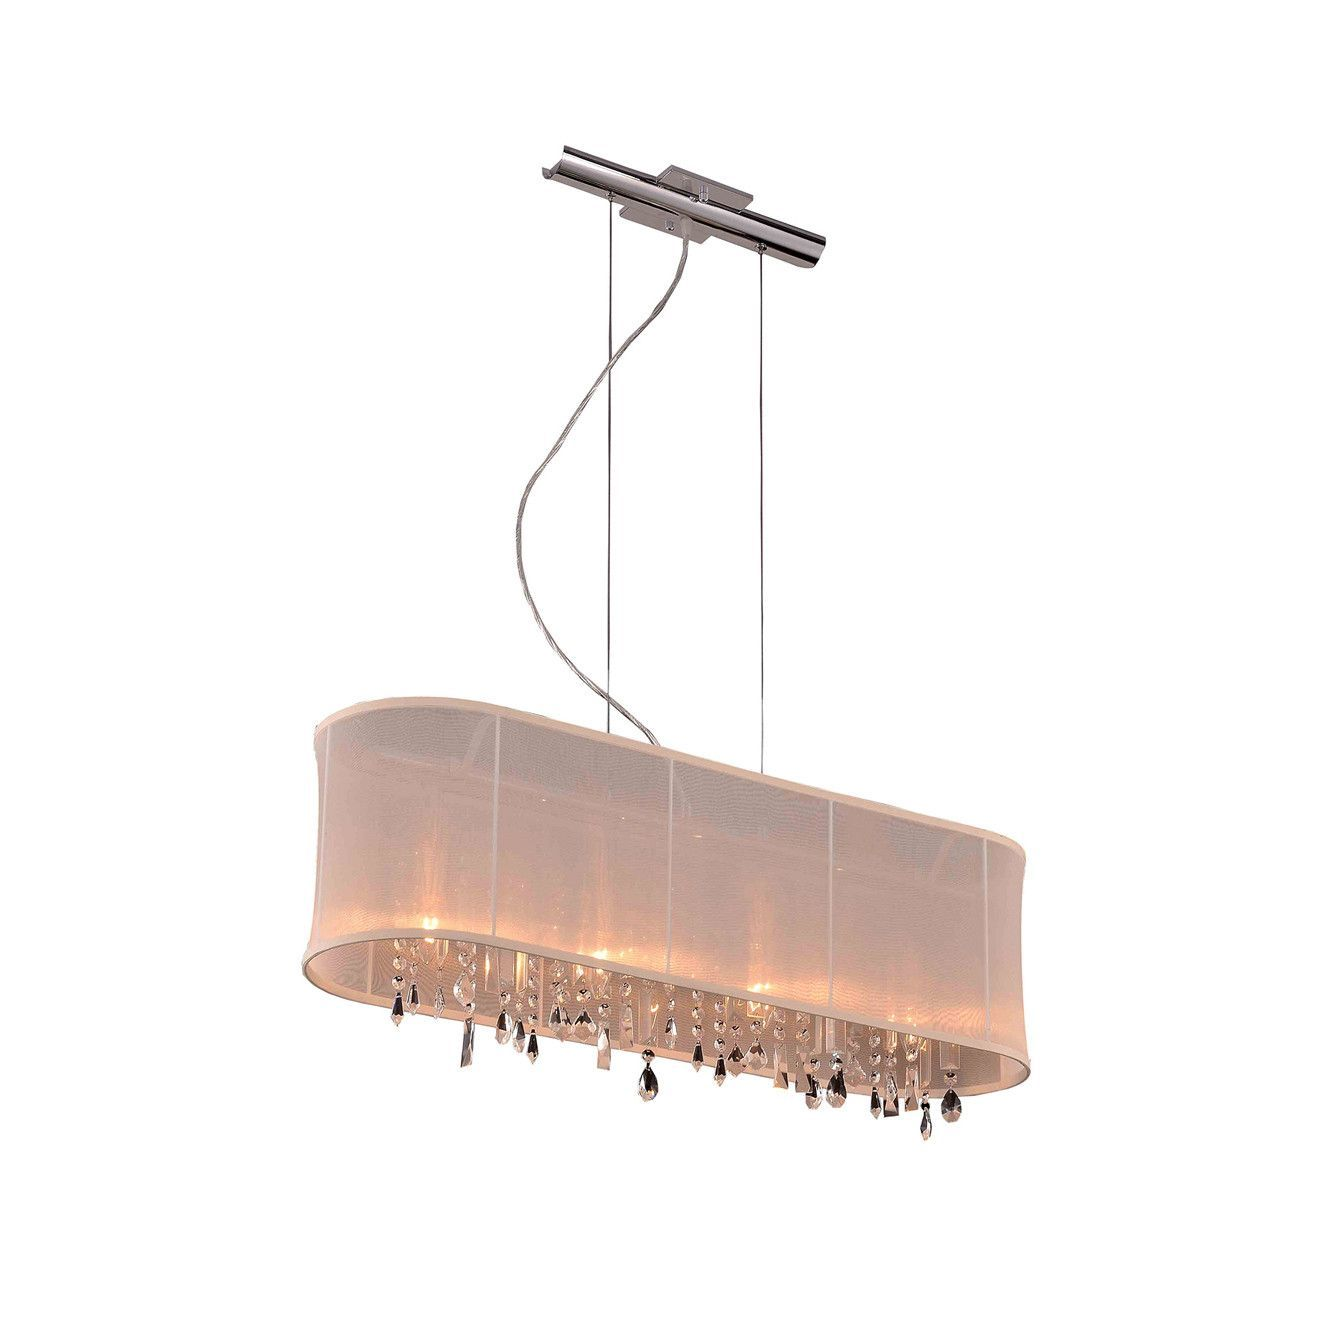 Elegant lighting dcrc harmony collection hanging fixture w